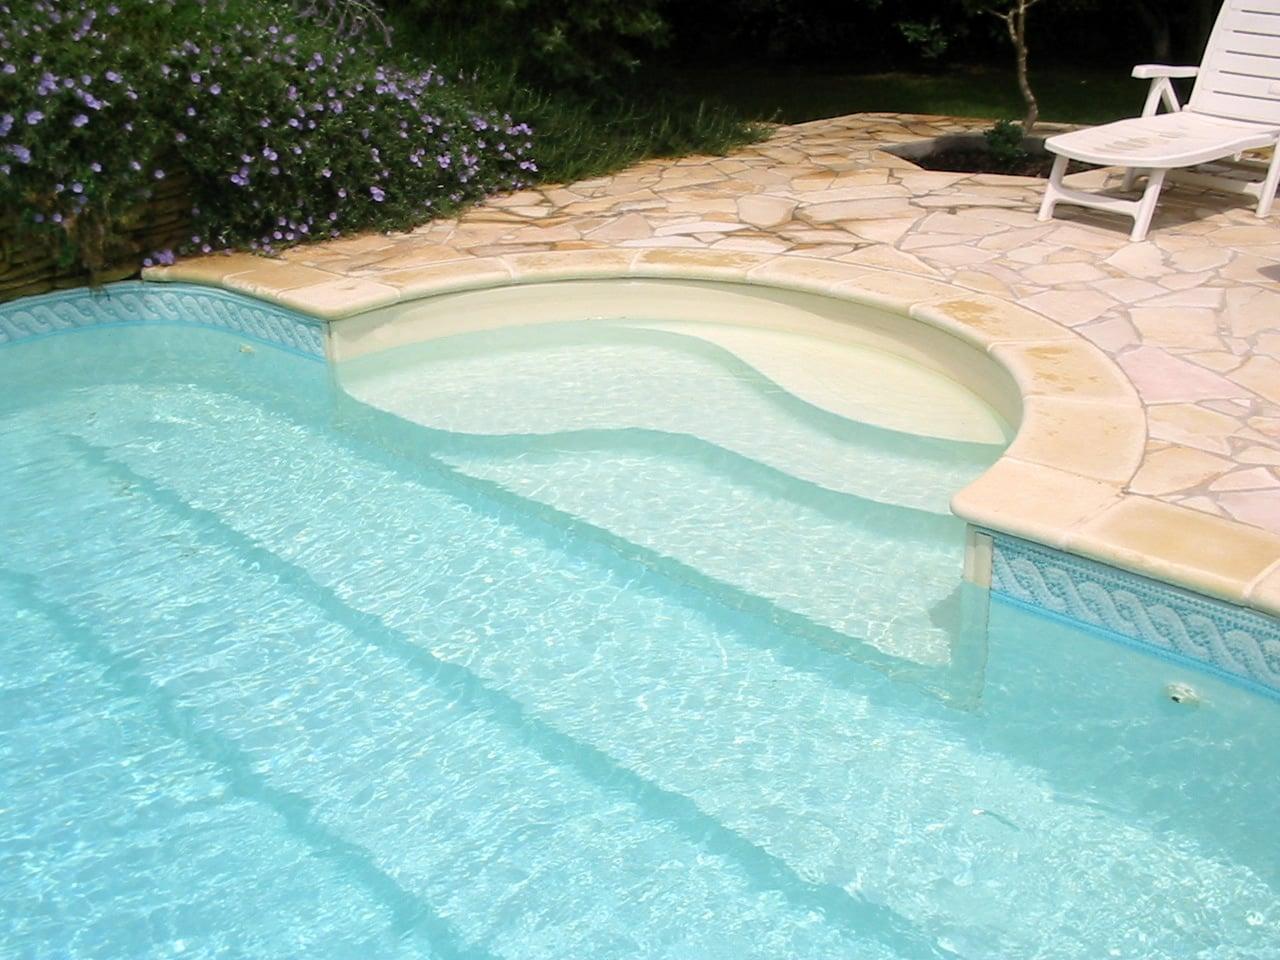 Piscina interrata in vetroresina costruire piscina - Quanto costa costruire una piscina interrata fai da te ...